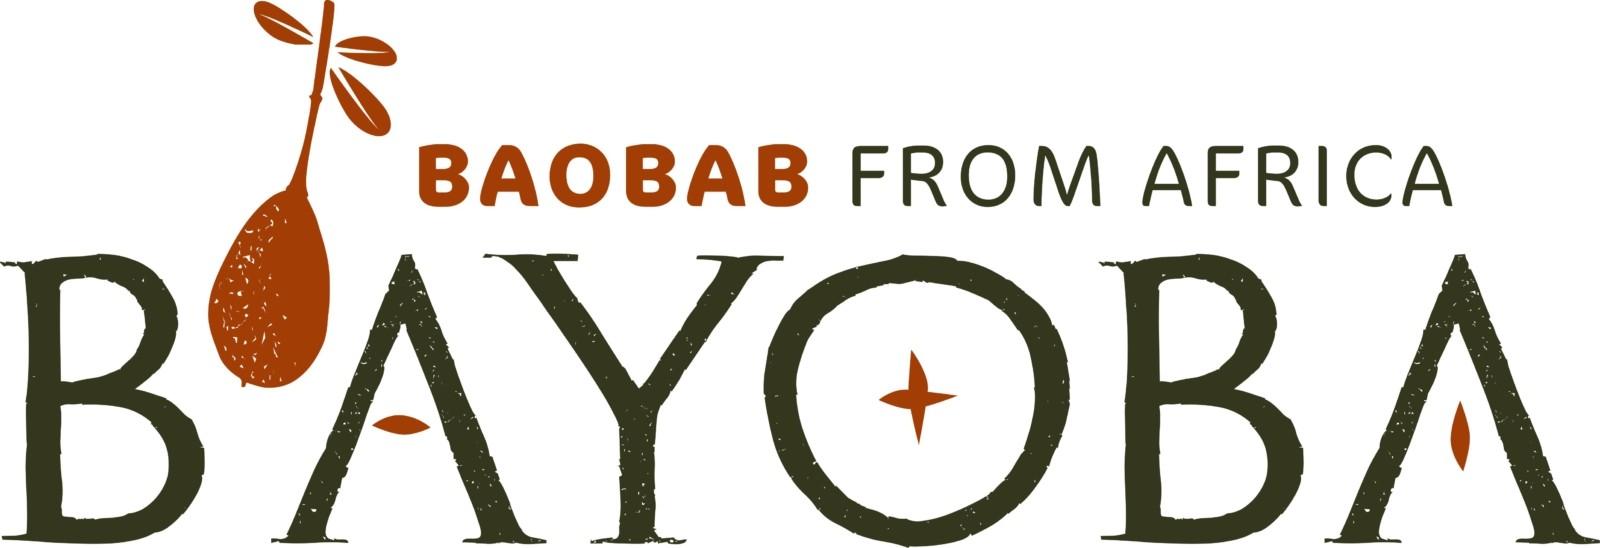 bayoba-logo-exhibitor-BioFach